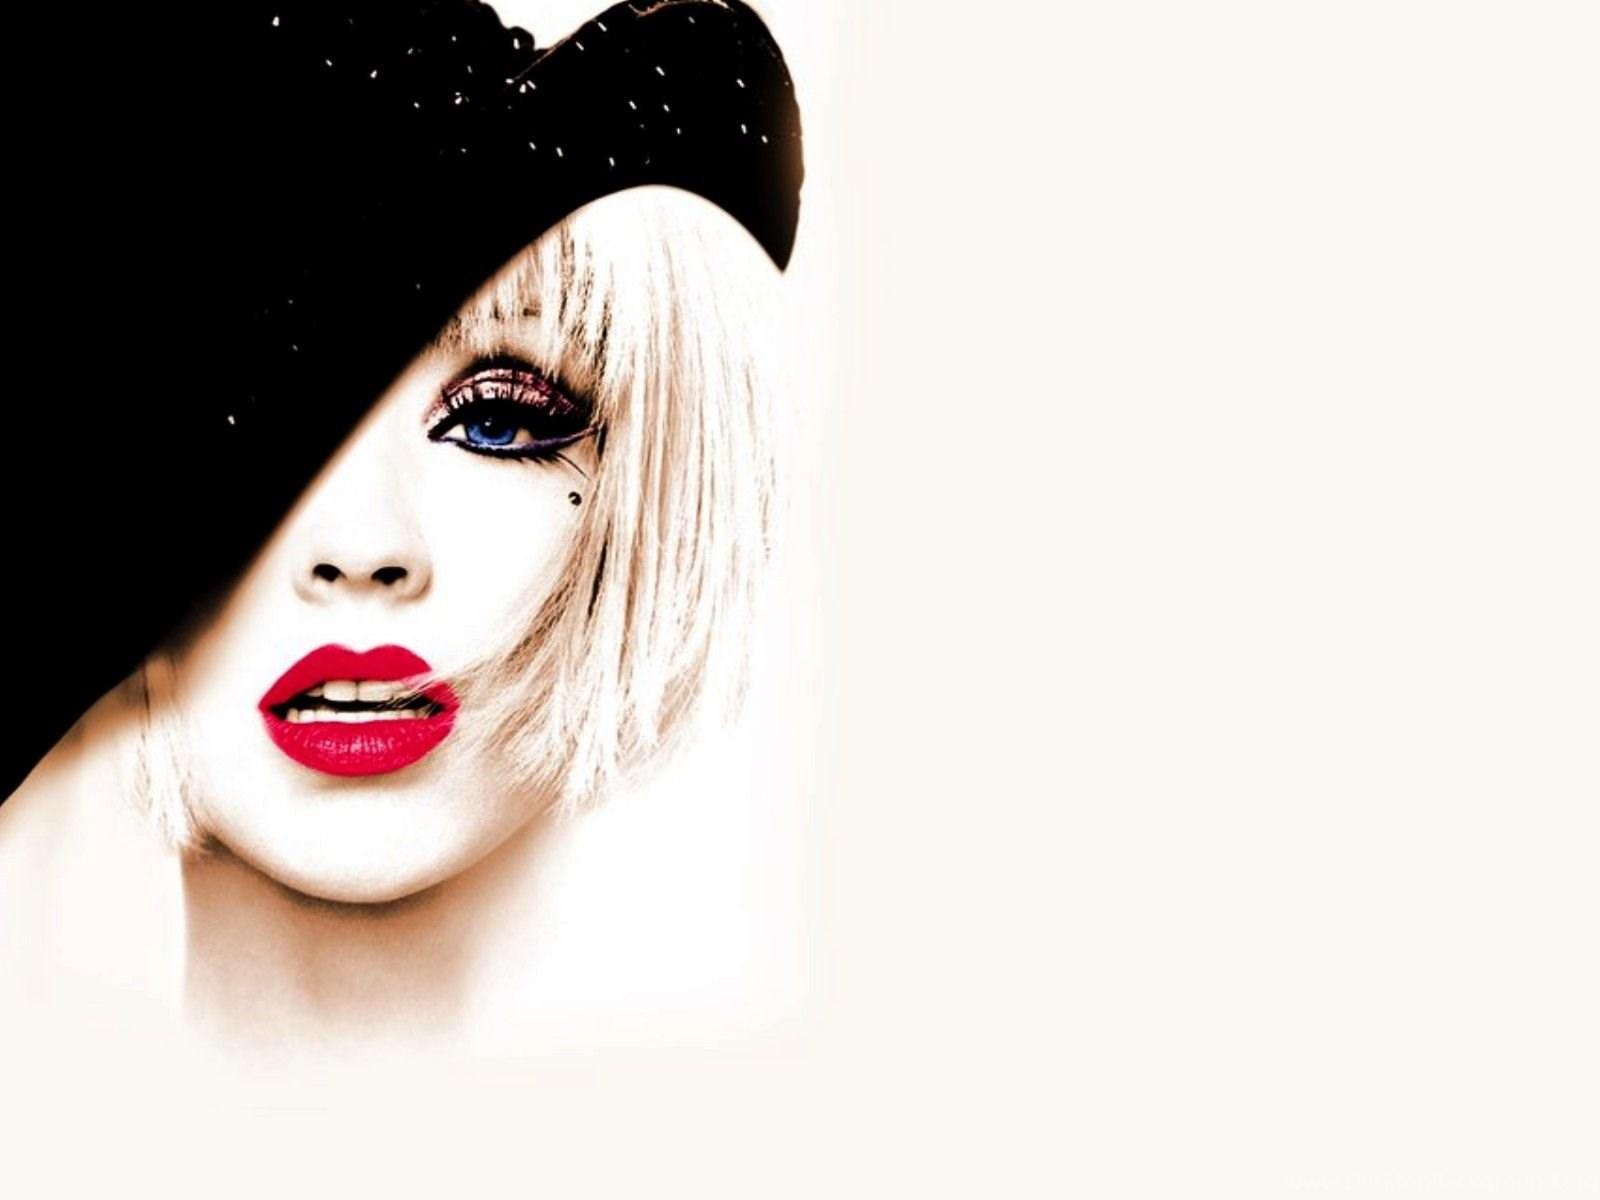 Christina Aguilera Christina Aguilera Wallpapers 25318494 Fanpop